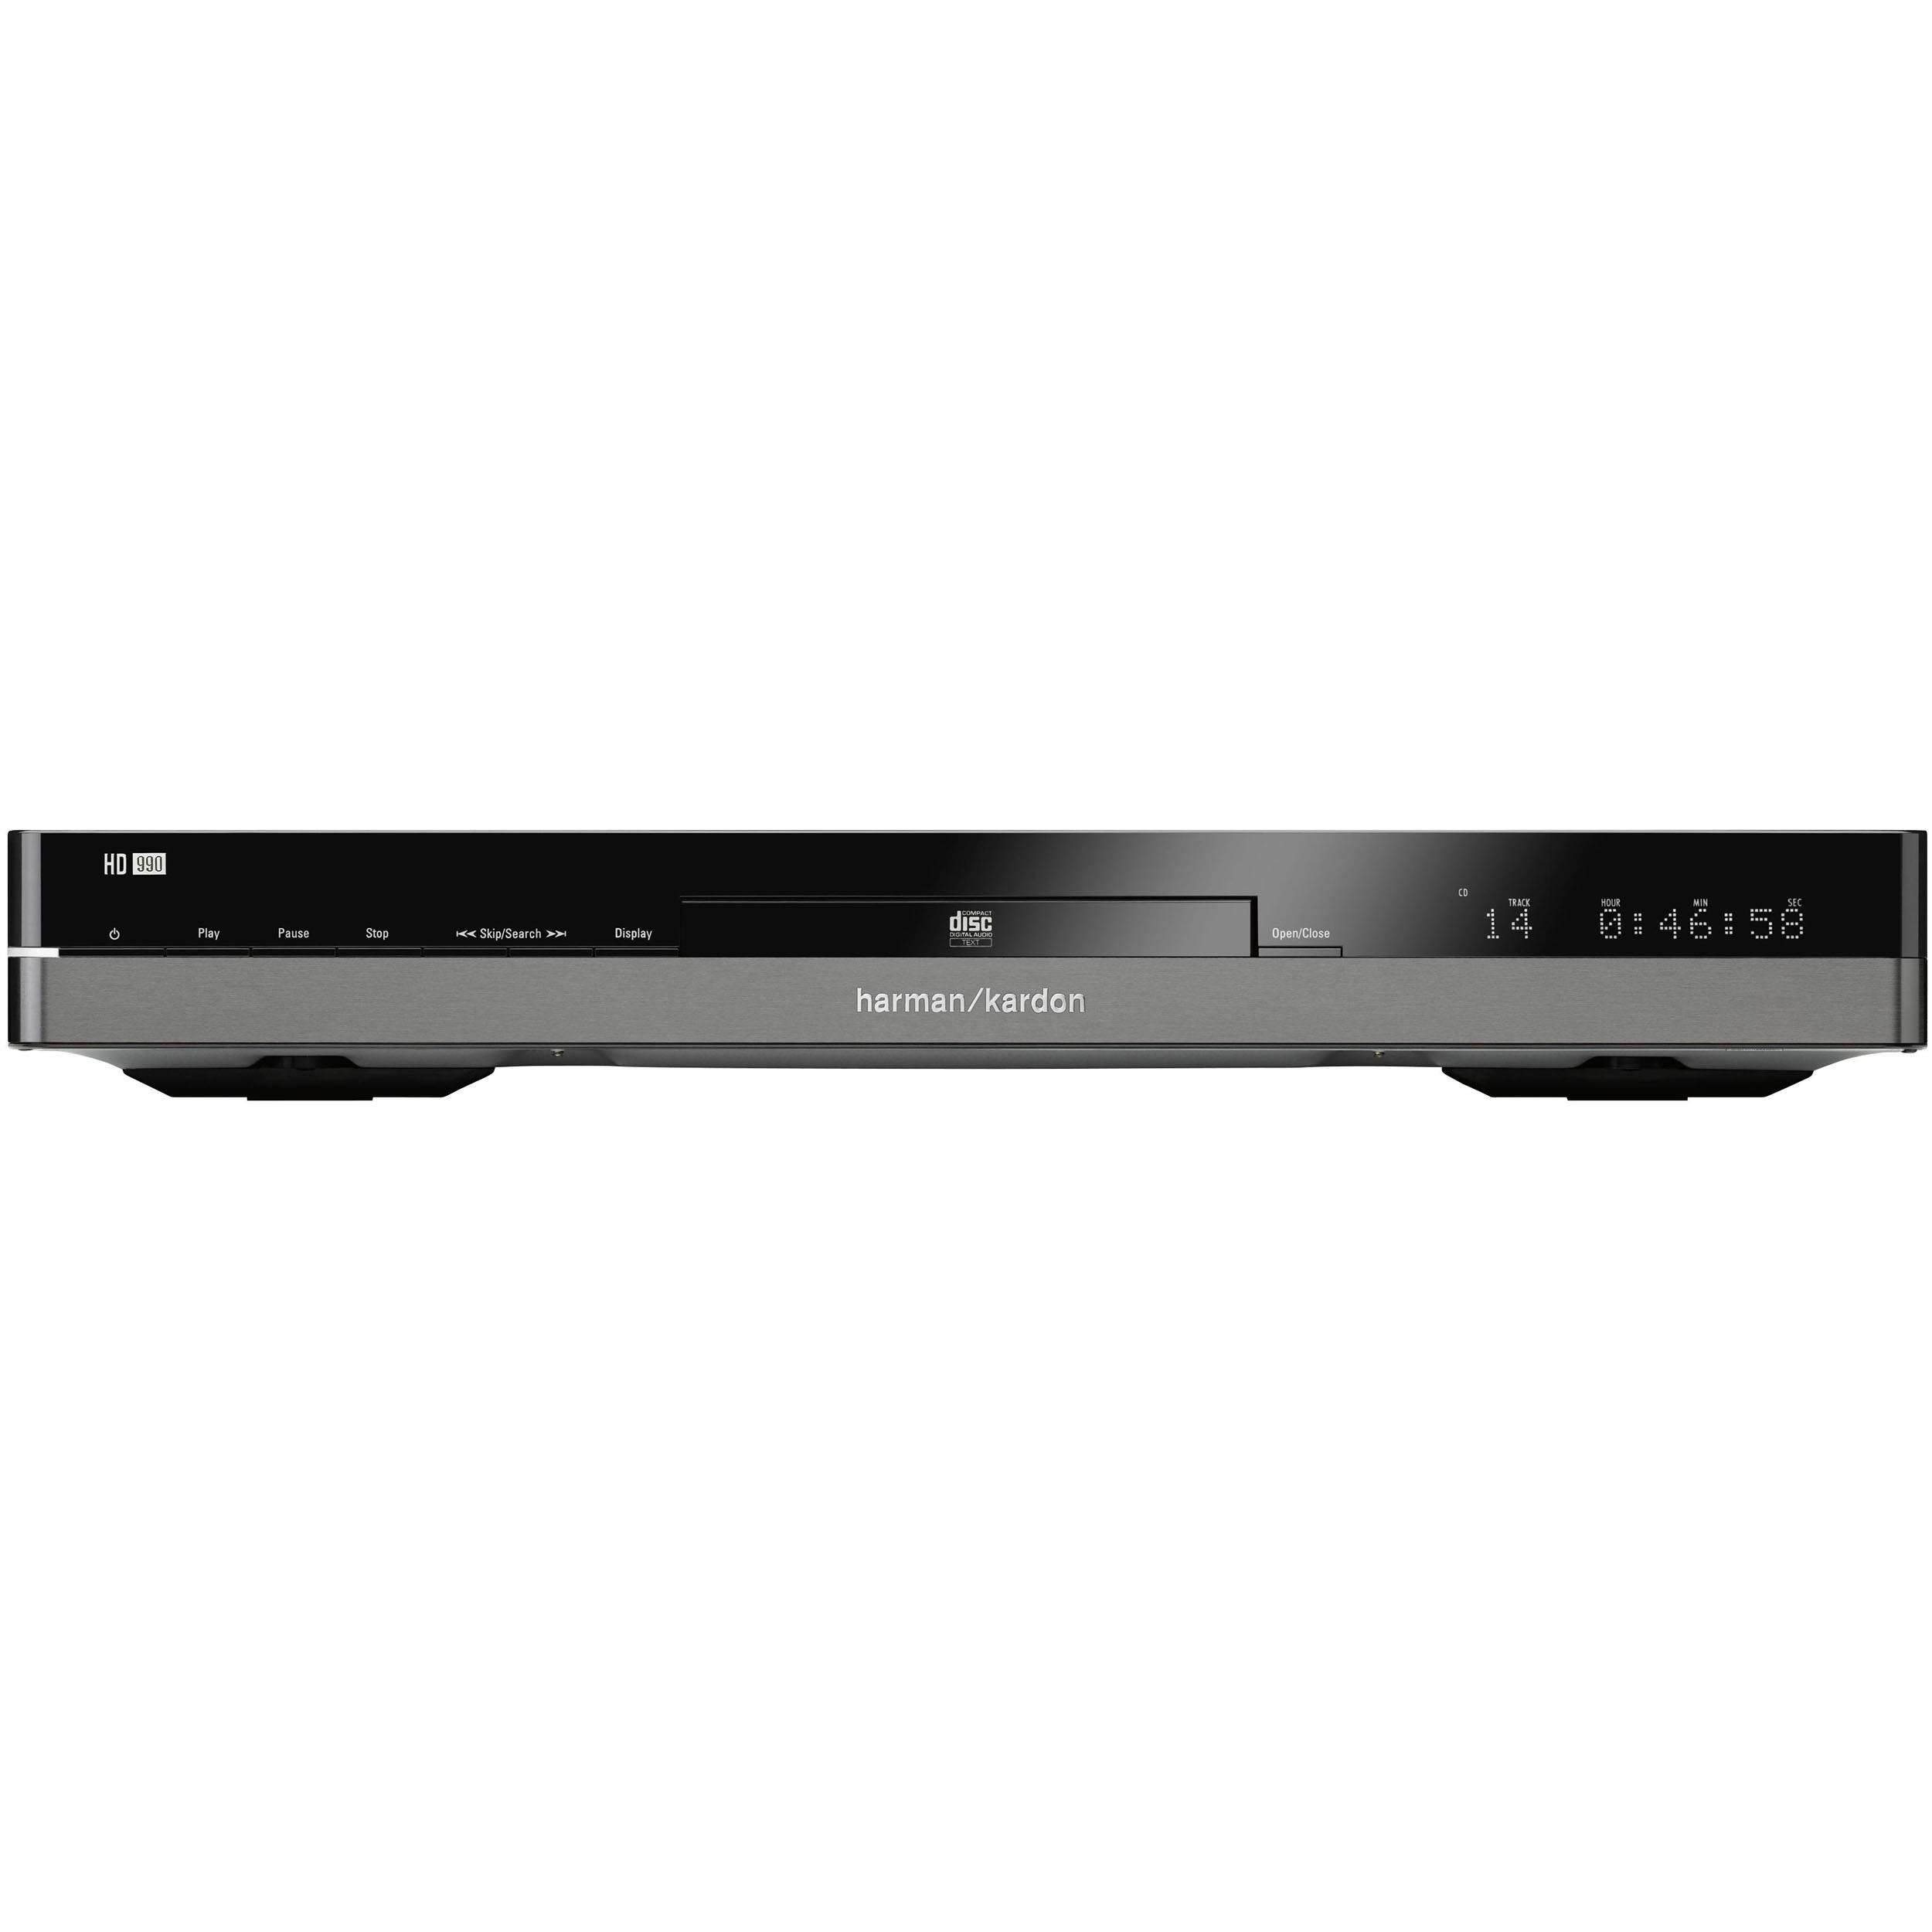 Harman Kardon HD-990 CD Player HD 990 B&H Photo Video